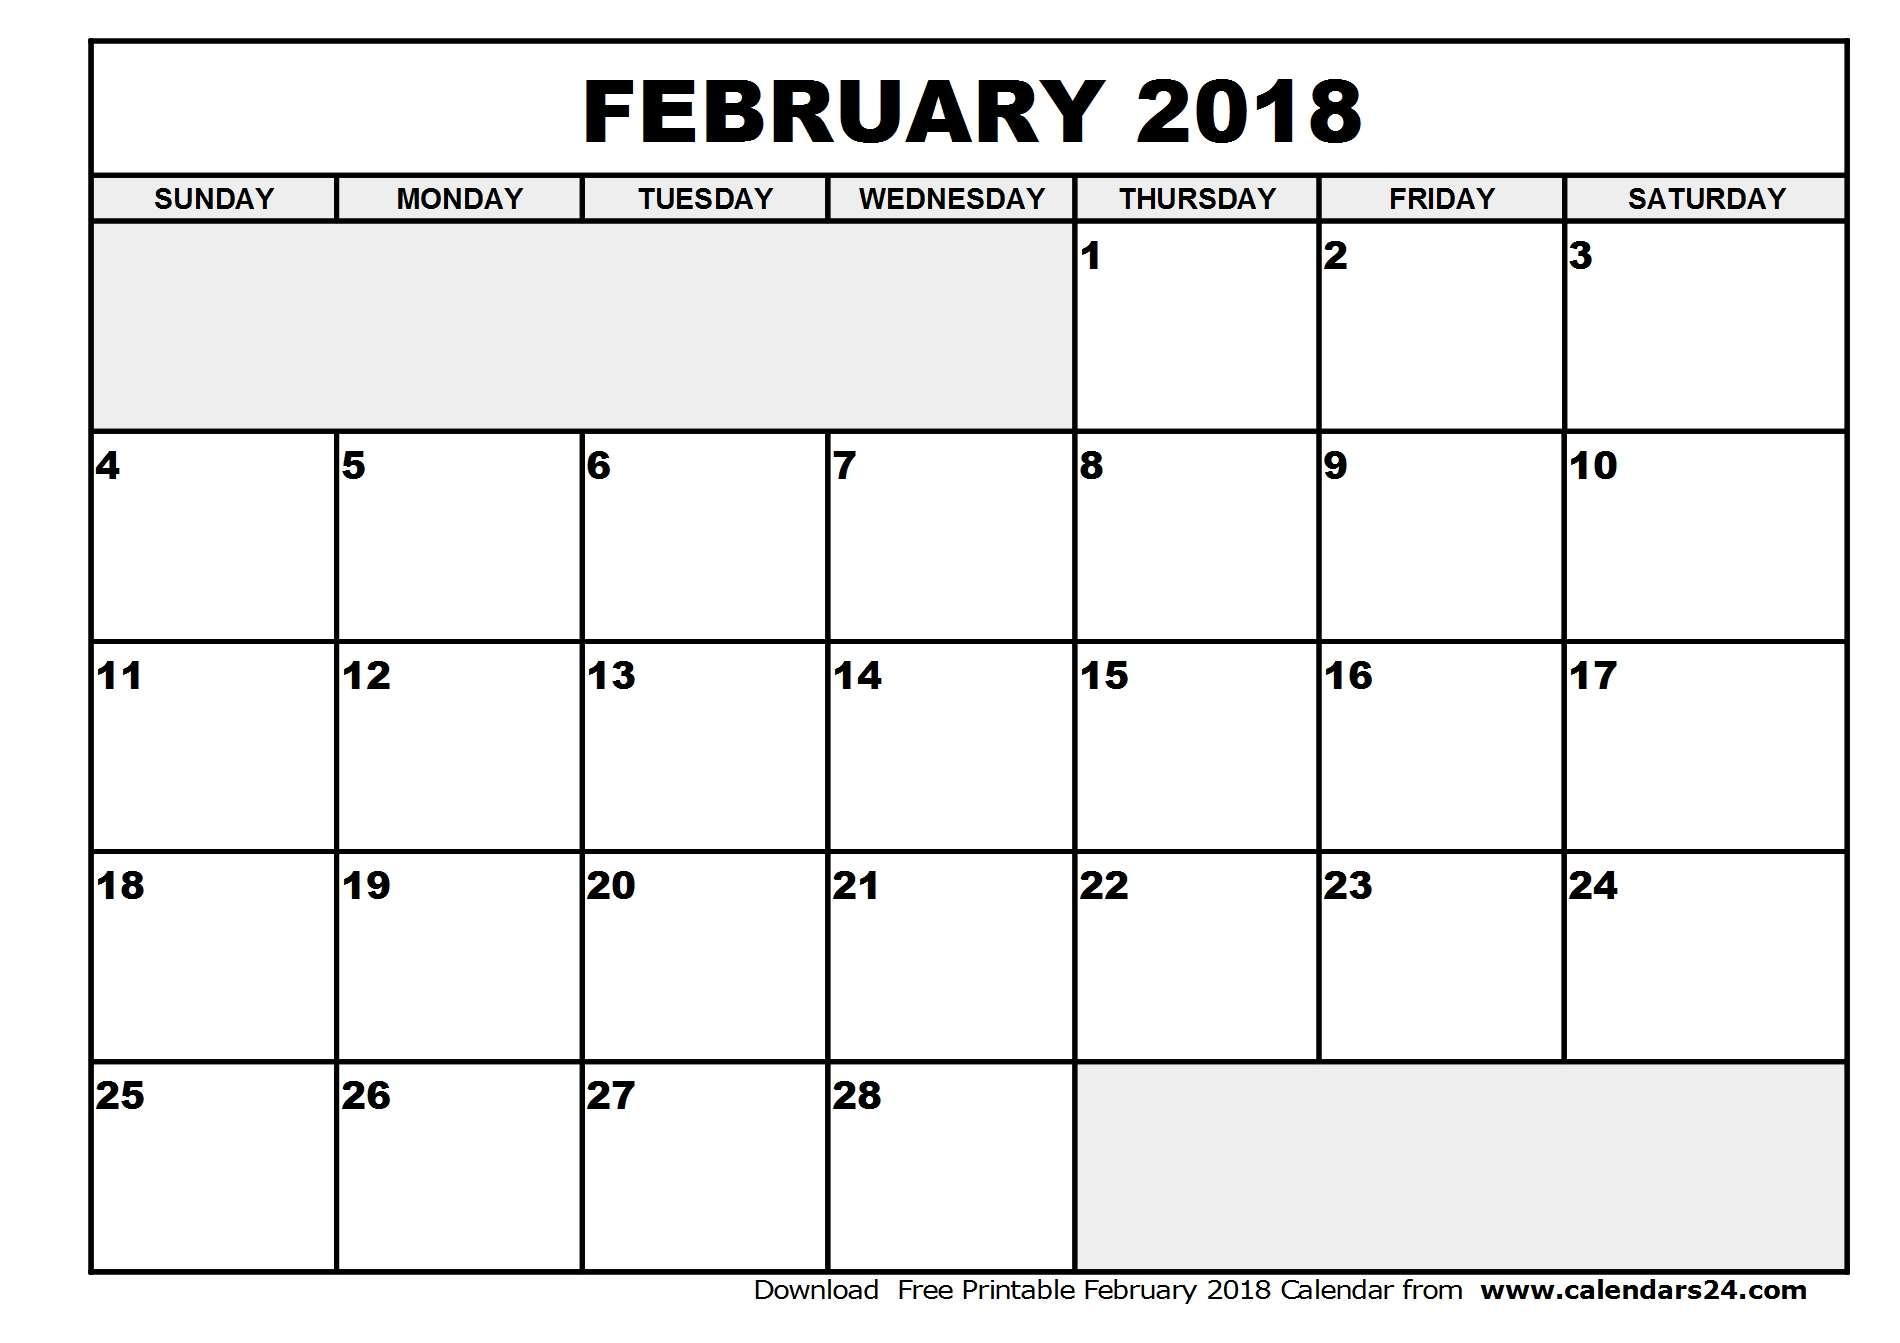 February 2018 Calendar & March 2018 Calendar